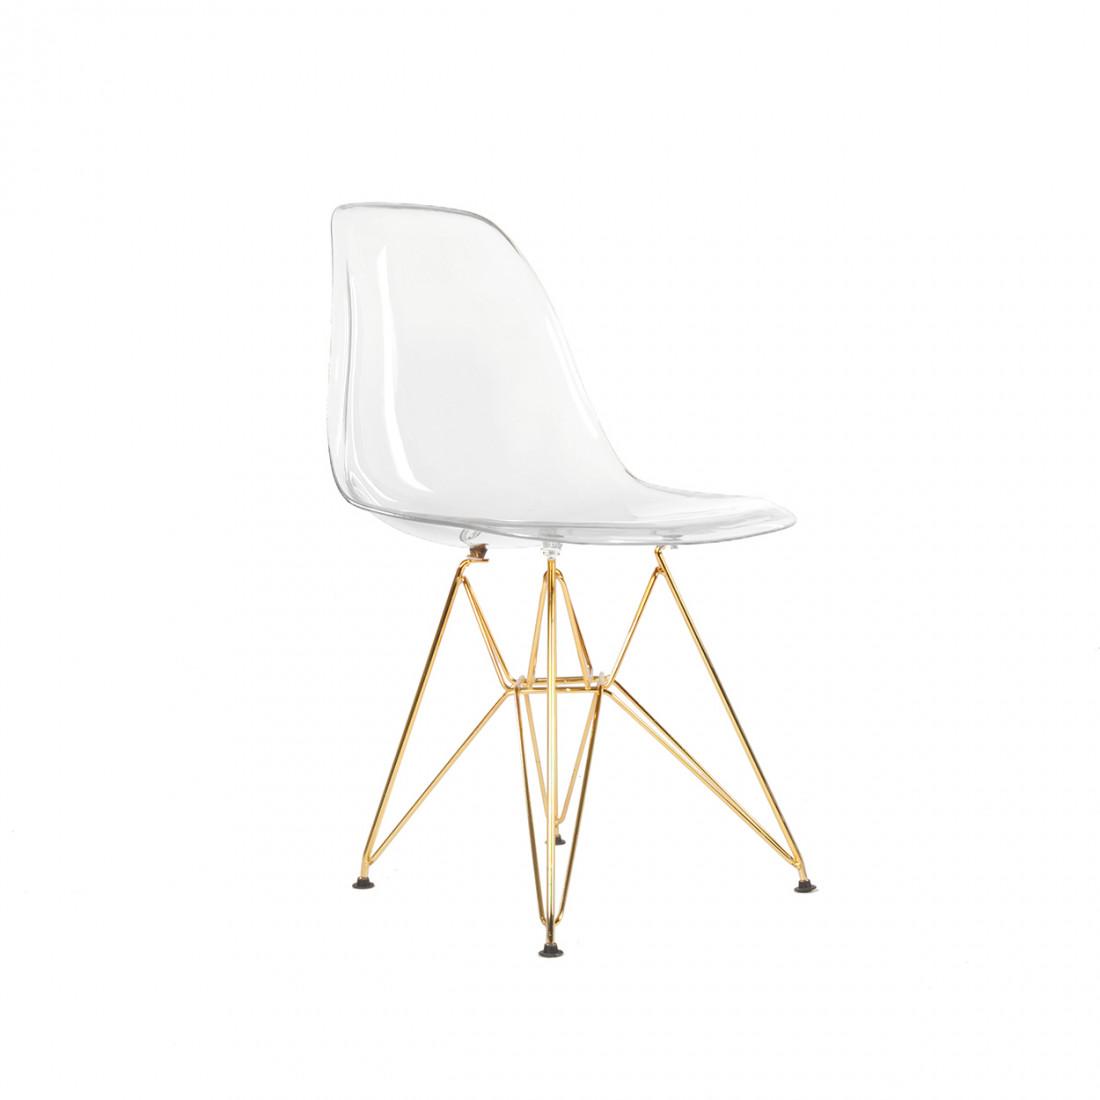 gold metal accent chair bauhaus swivel eiffel - mikaza meubles modernes montreal modern furniture ottawa.